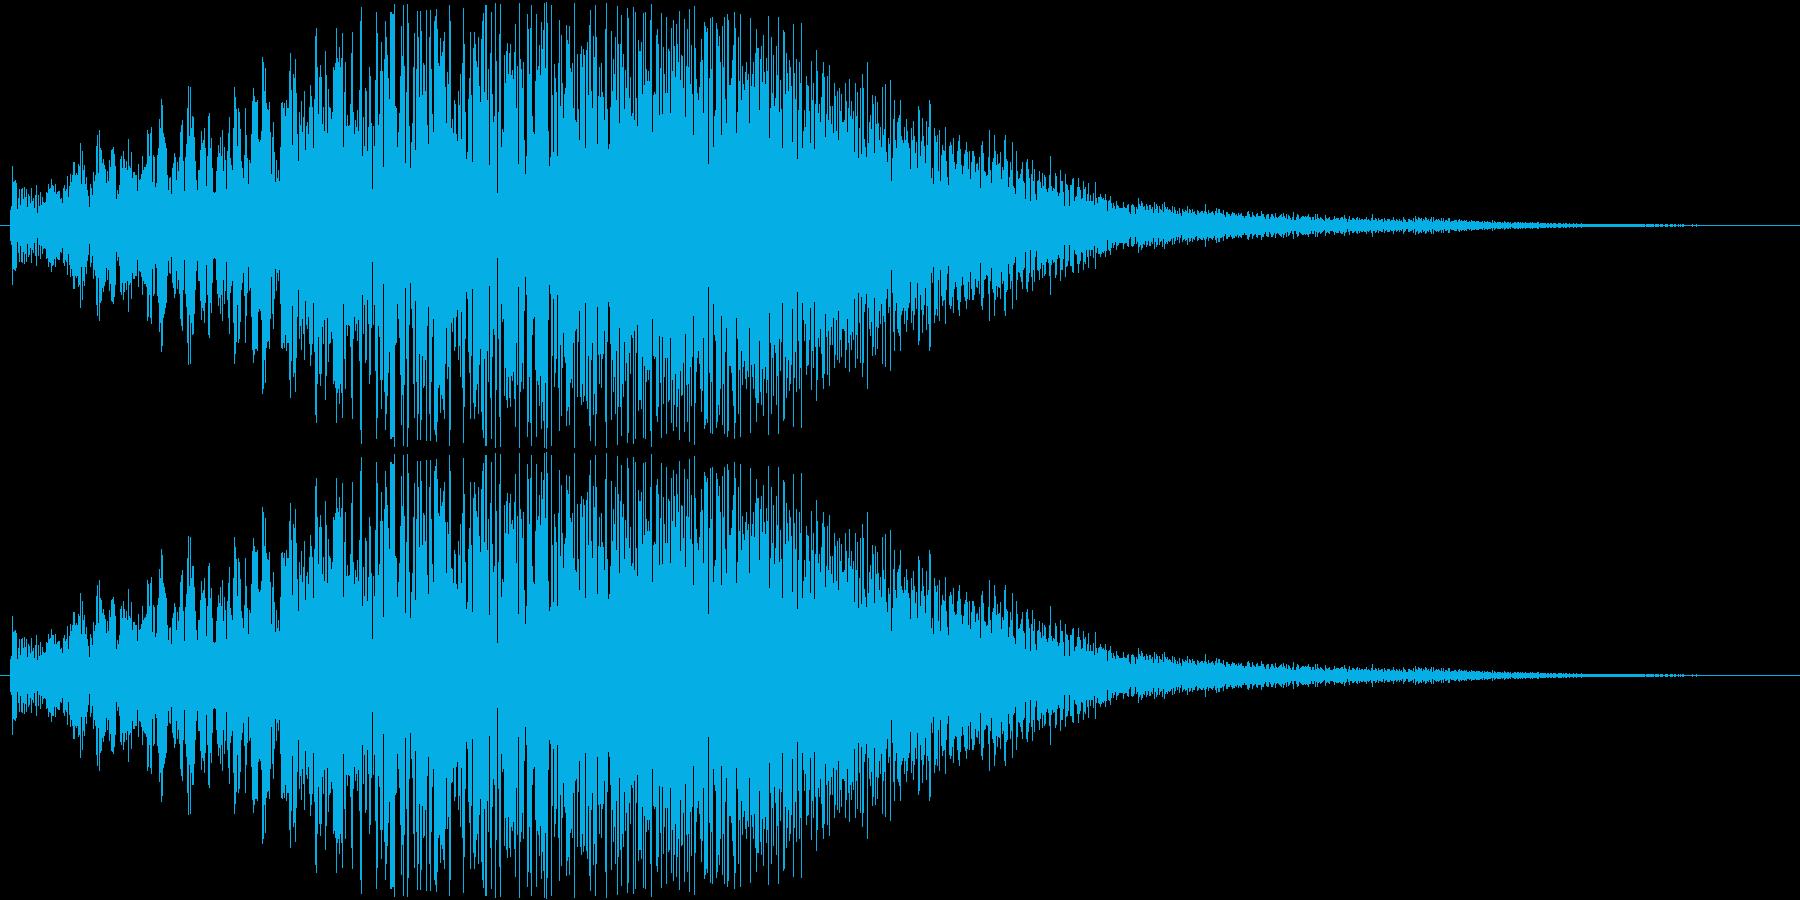 ティロロロロロロロロロロロロロンの再生済みの波形